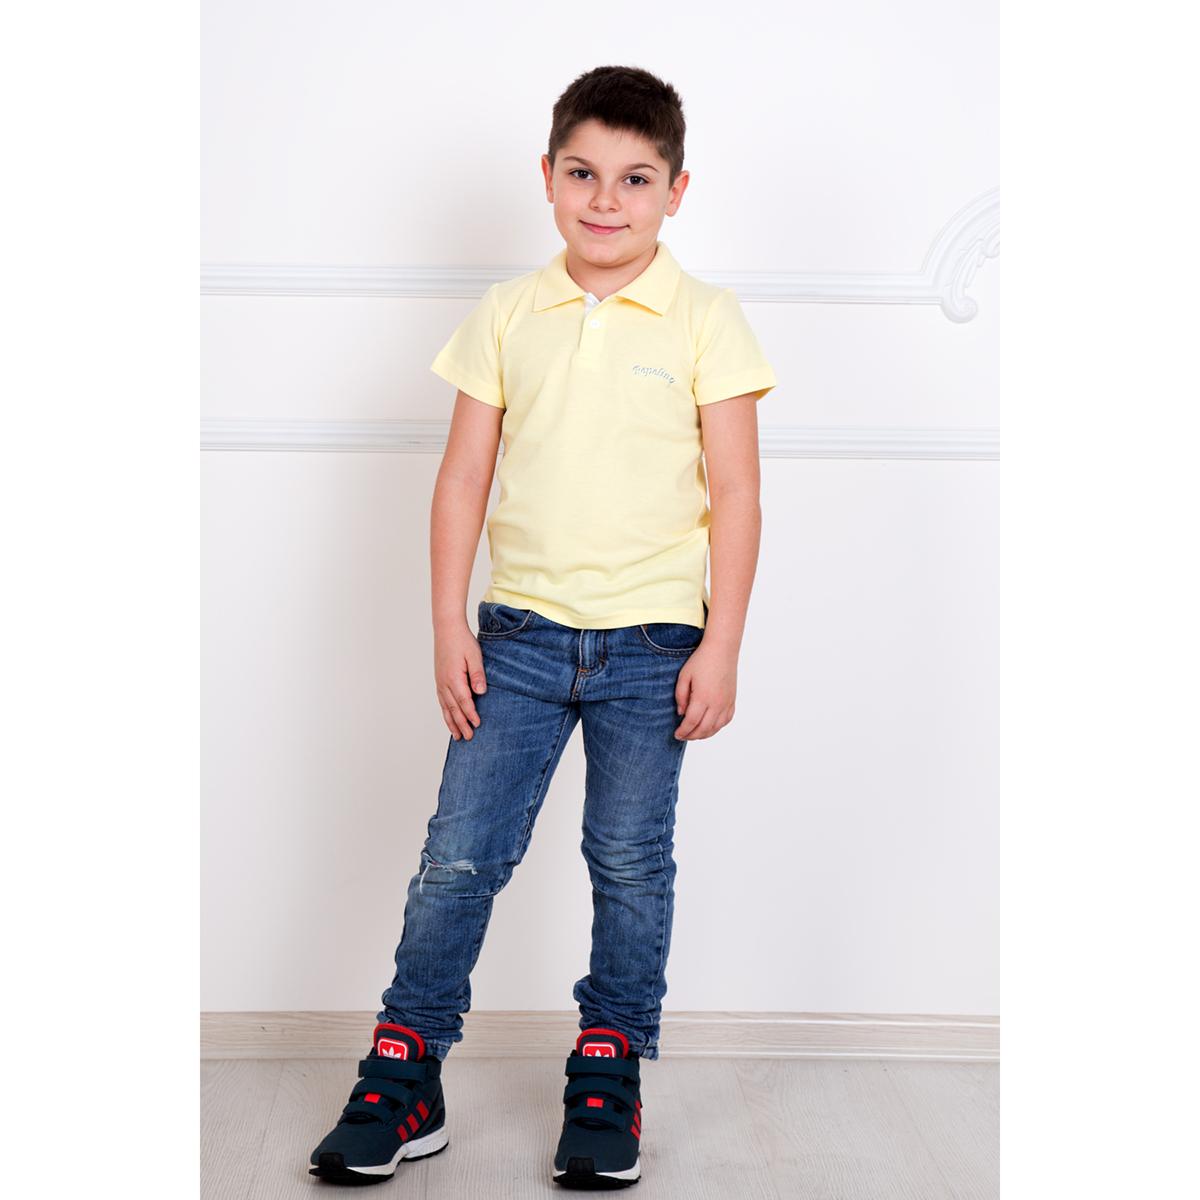 "Фото #1: Детская футболка-поло ""Круиз"", размер 3 года"